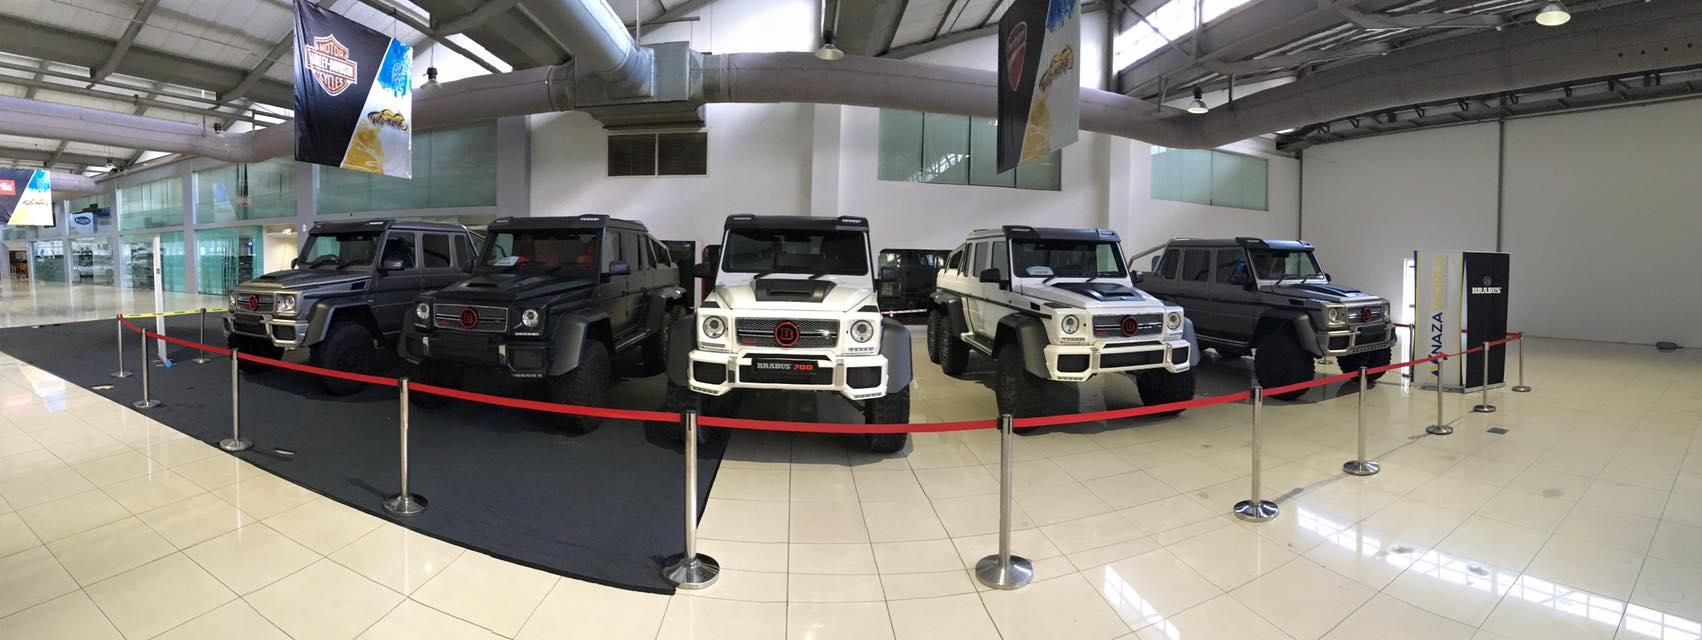 15 Brabus 700 Mercedes Benz G63 Amg 6x6 In Malaysia Gtspirit